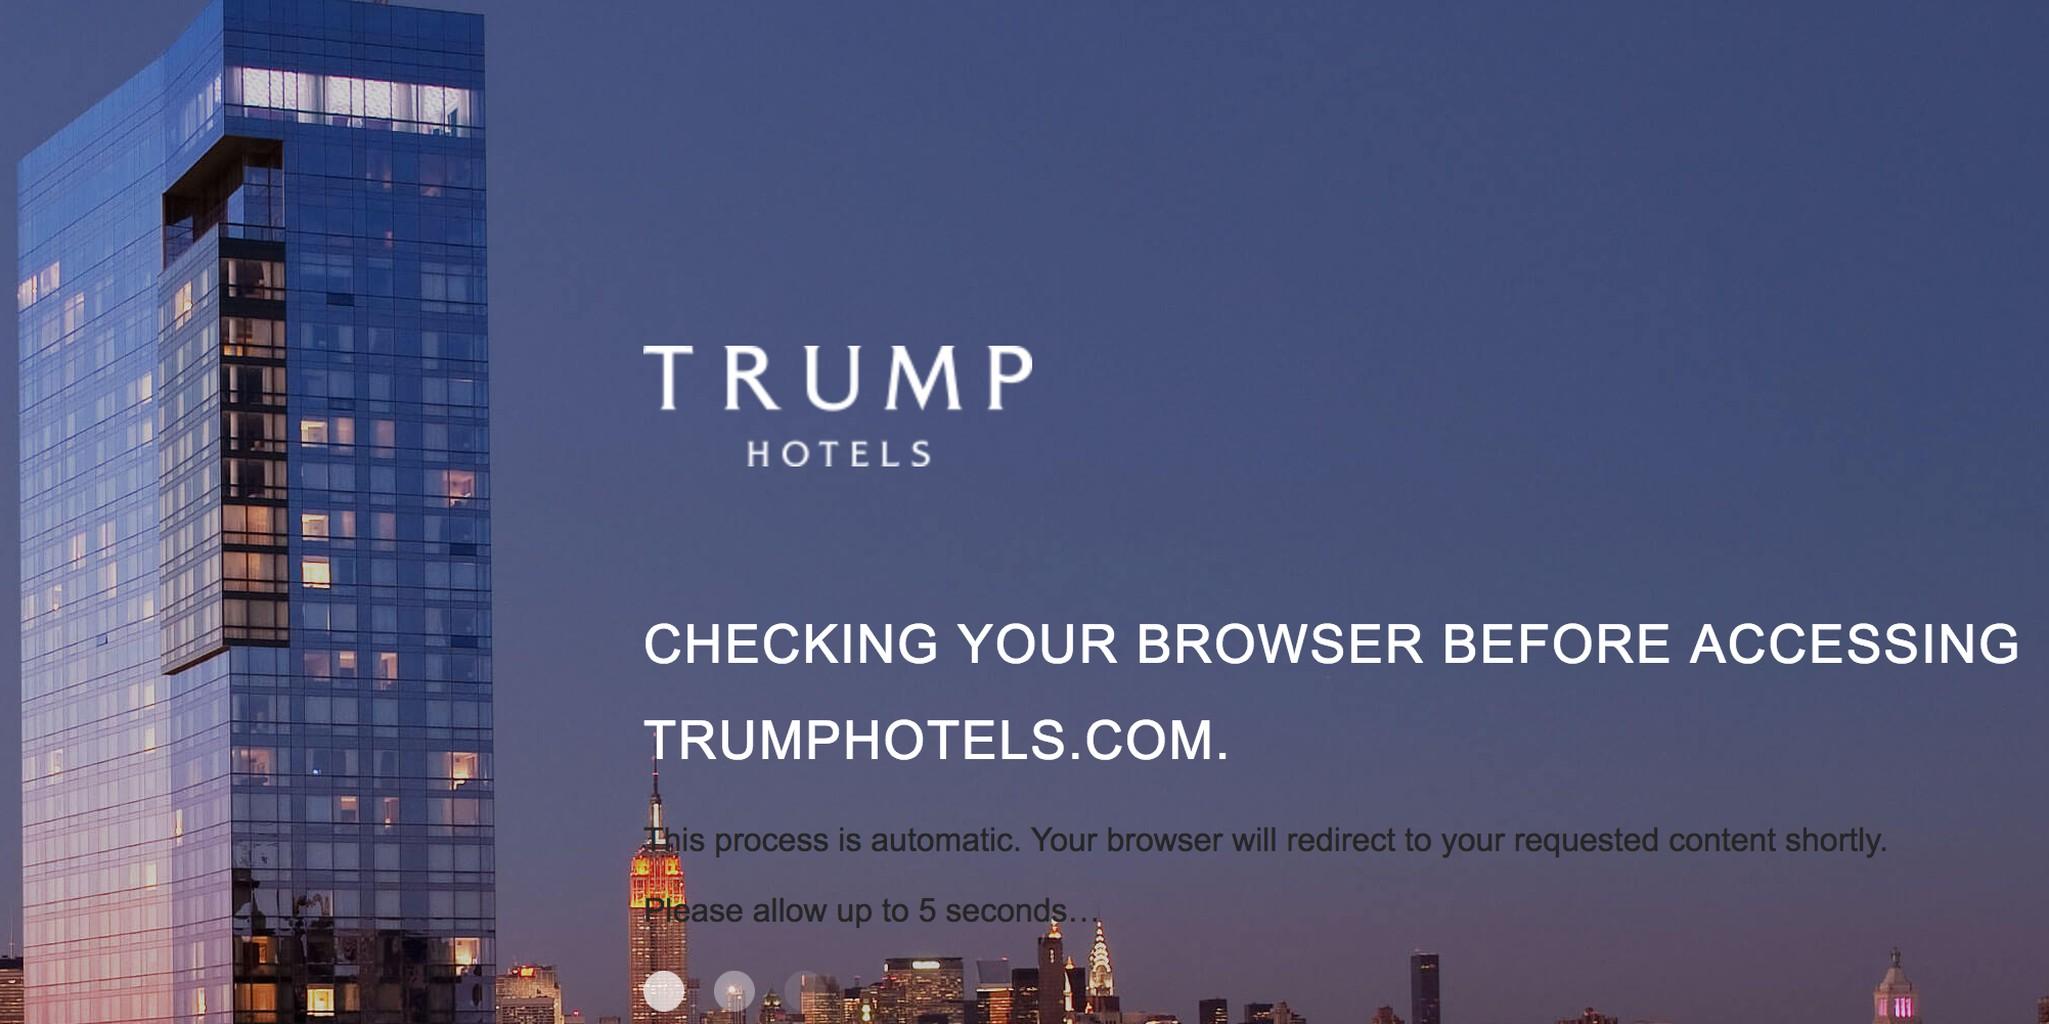 Trump Hotels website